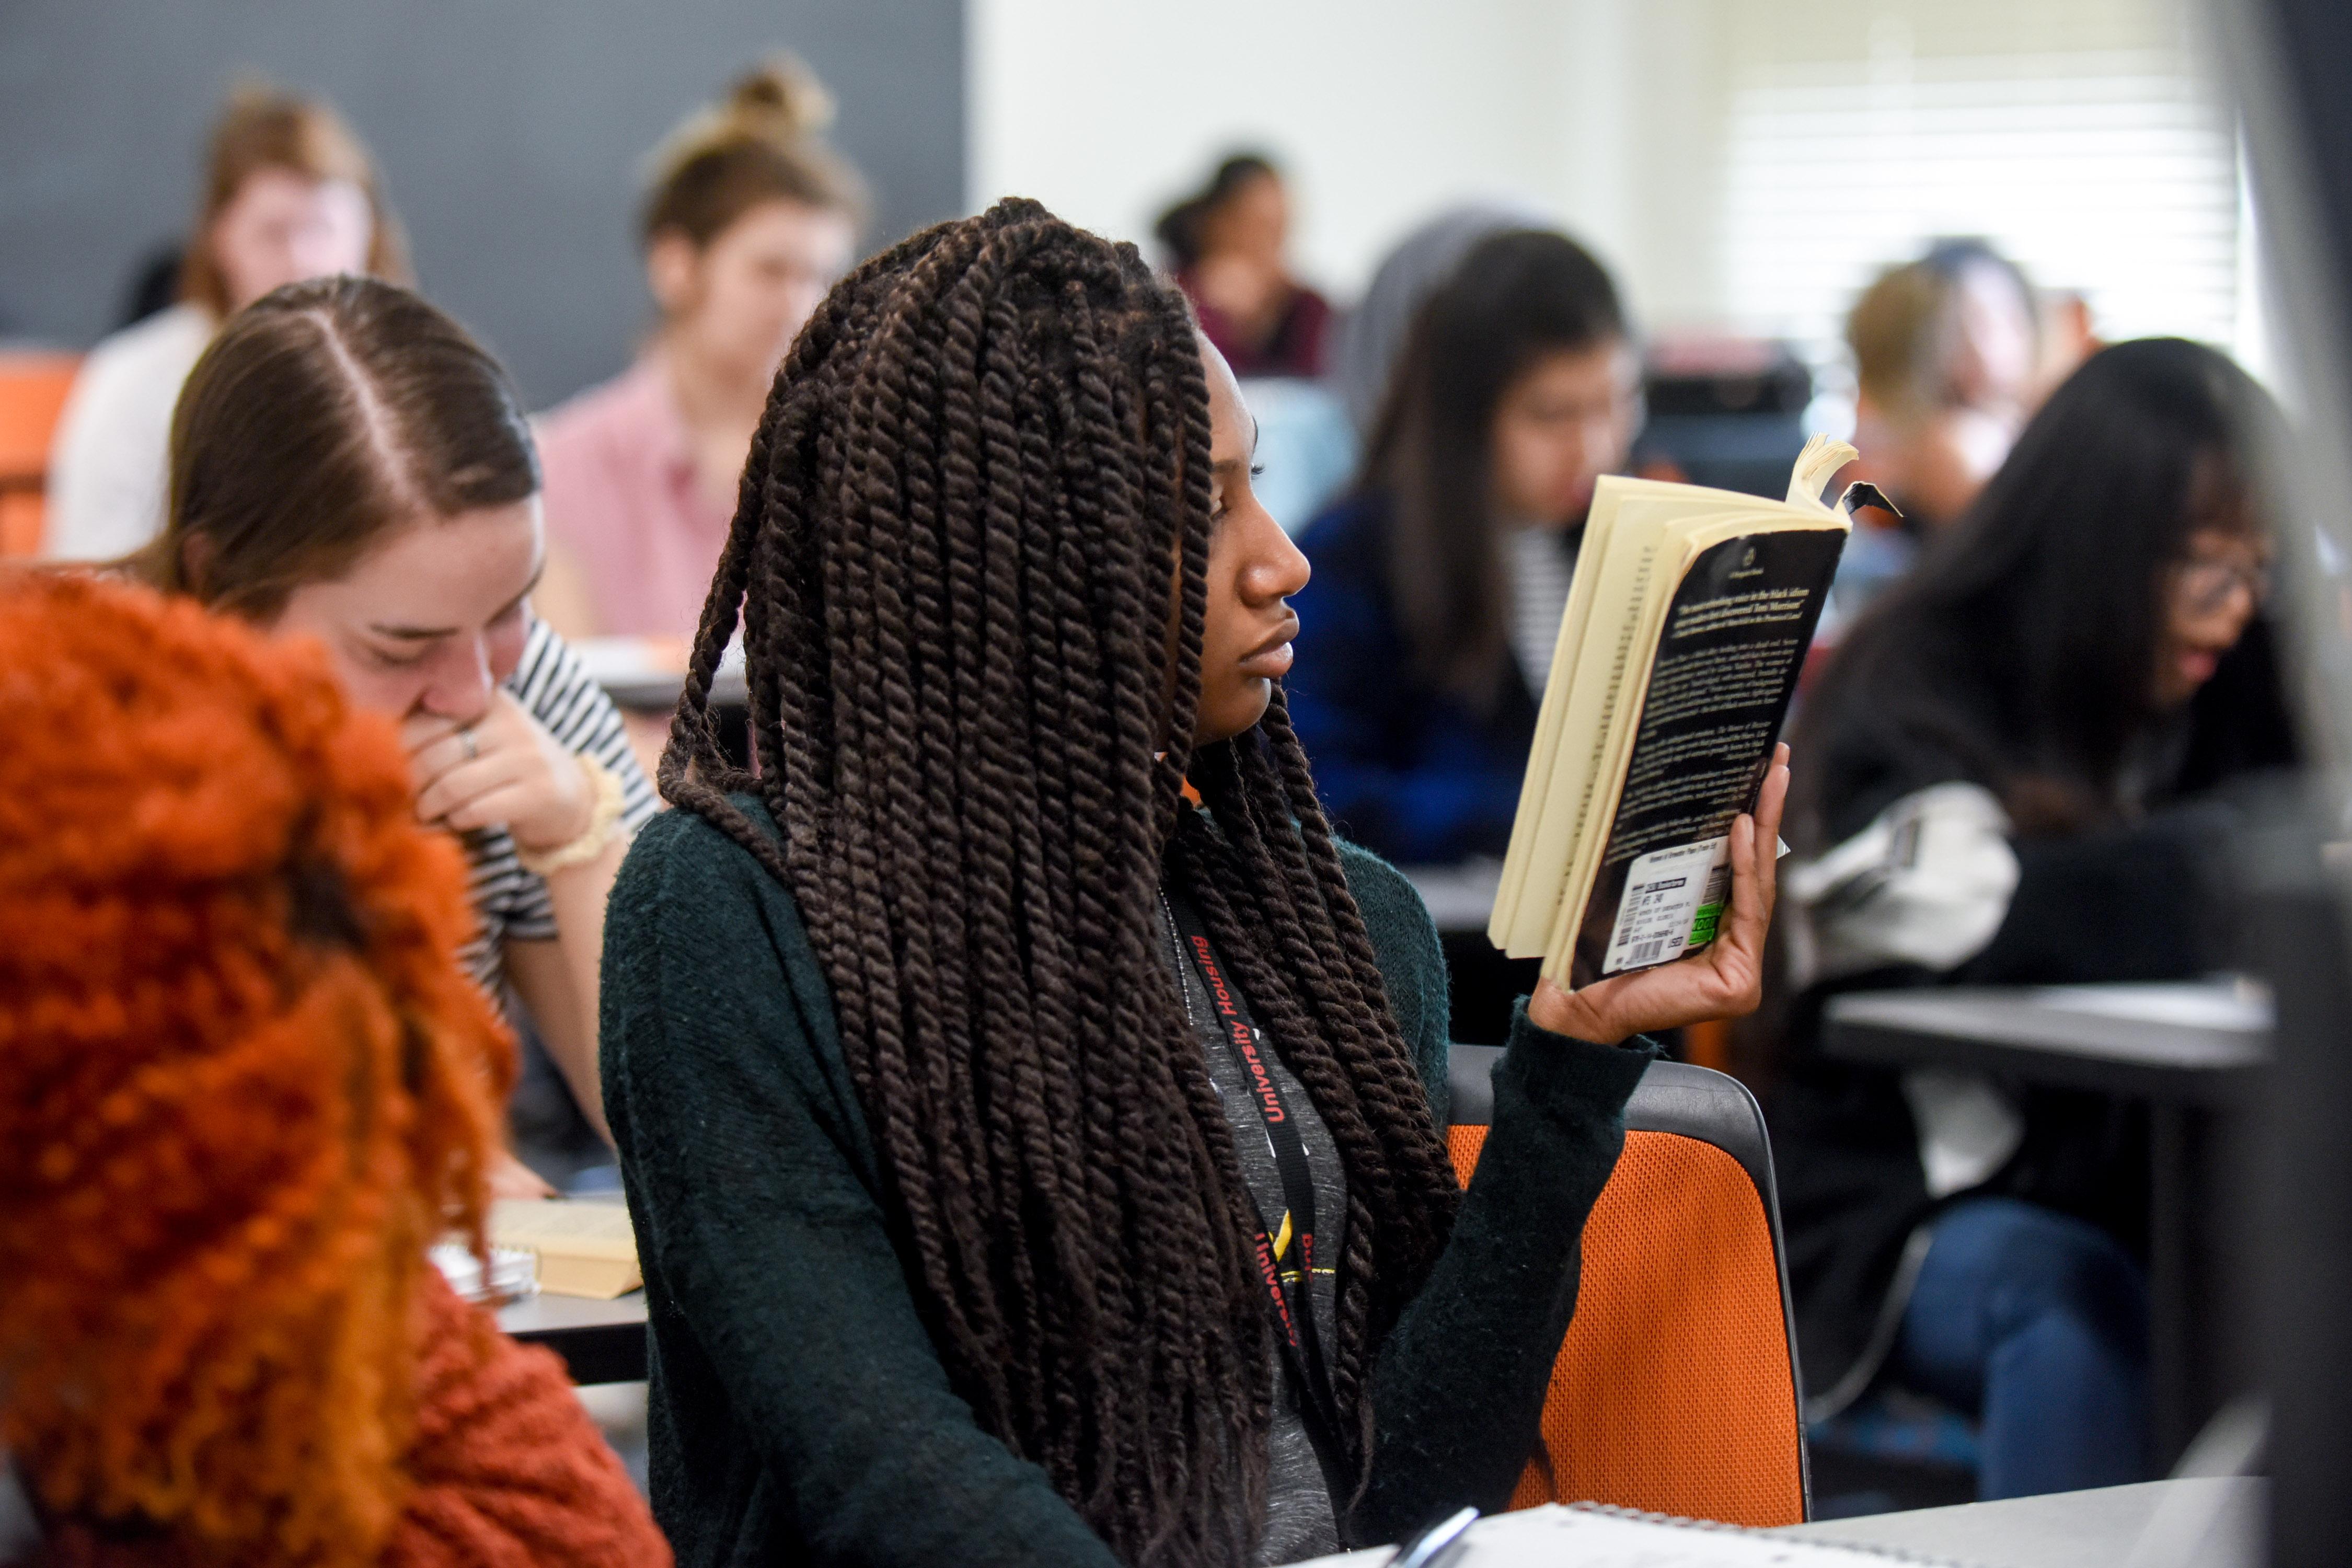 https://cdn.chass.ncsu.edu/sites/english.chass.ncsu.edu/images/english-6227-dudley-students.jpg